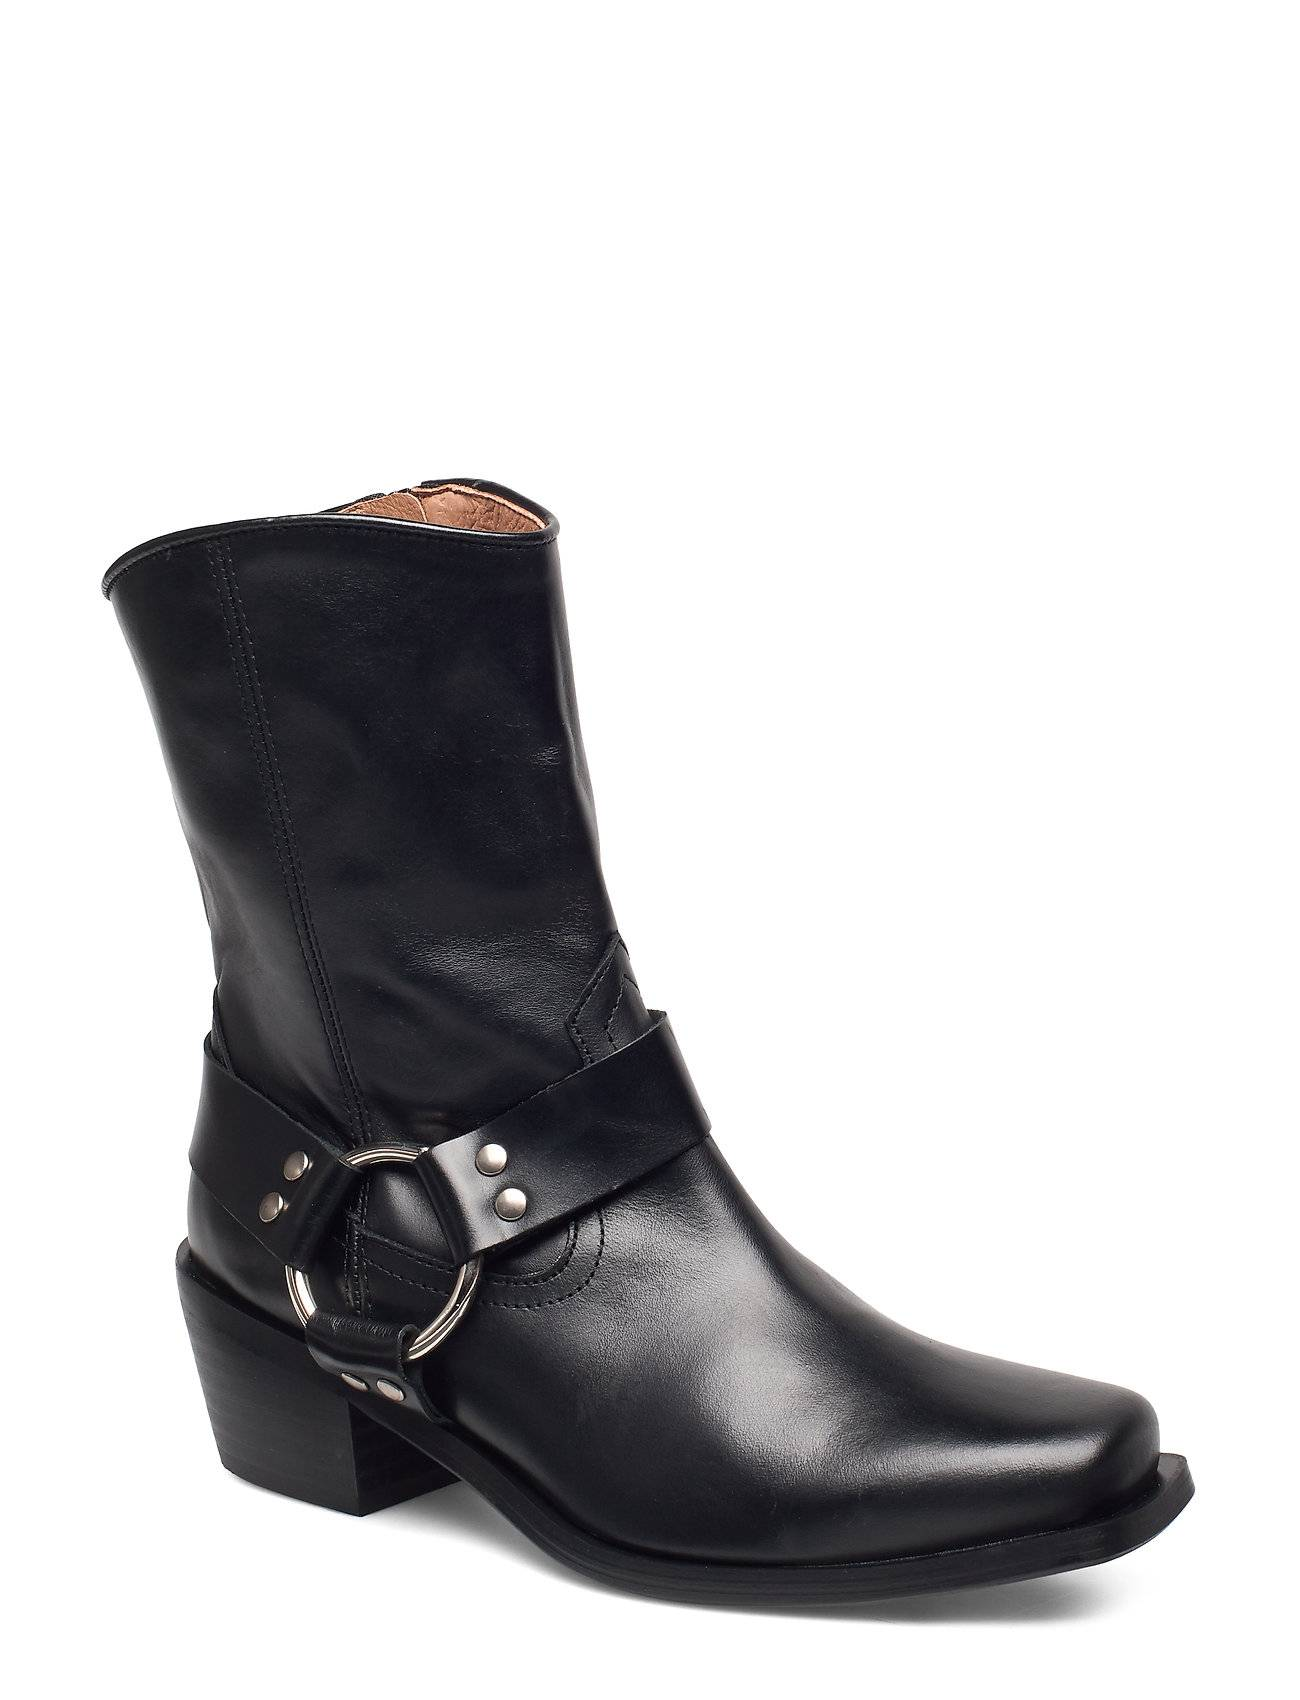 Henry Kole Hazel Leather Black Shoes Boots Ankle Boots Ankle Boots With Heel Musta Henry Kole